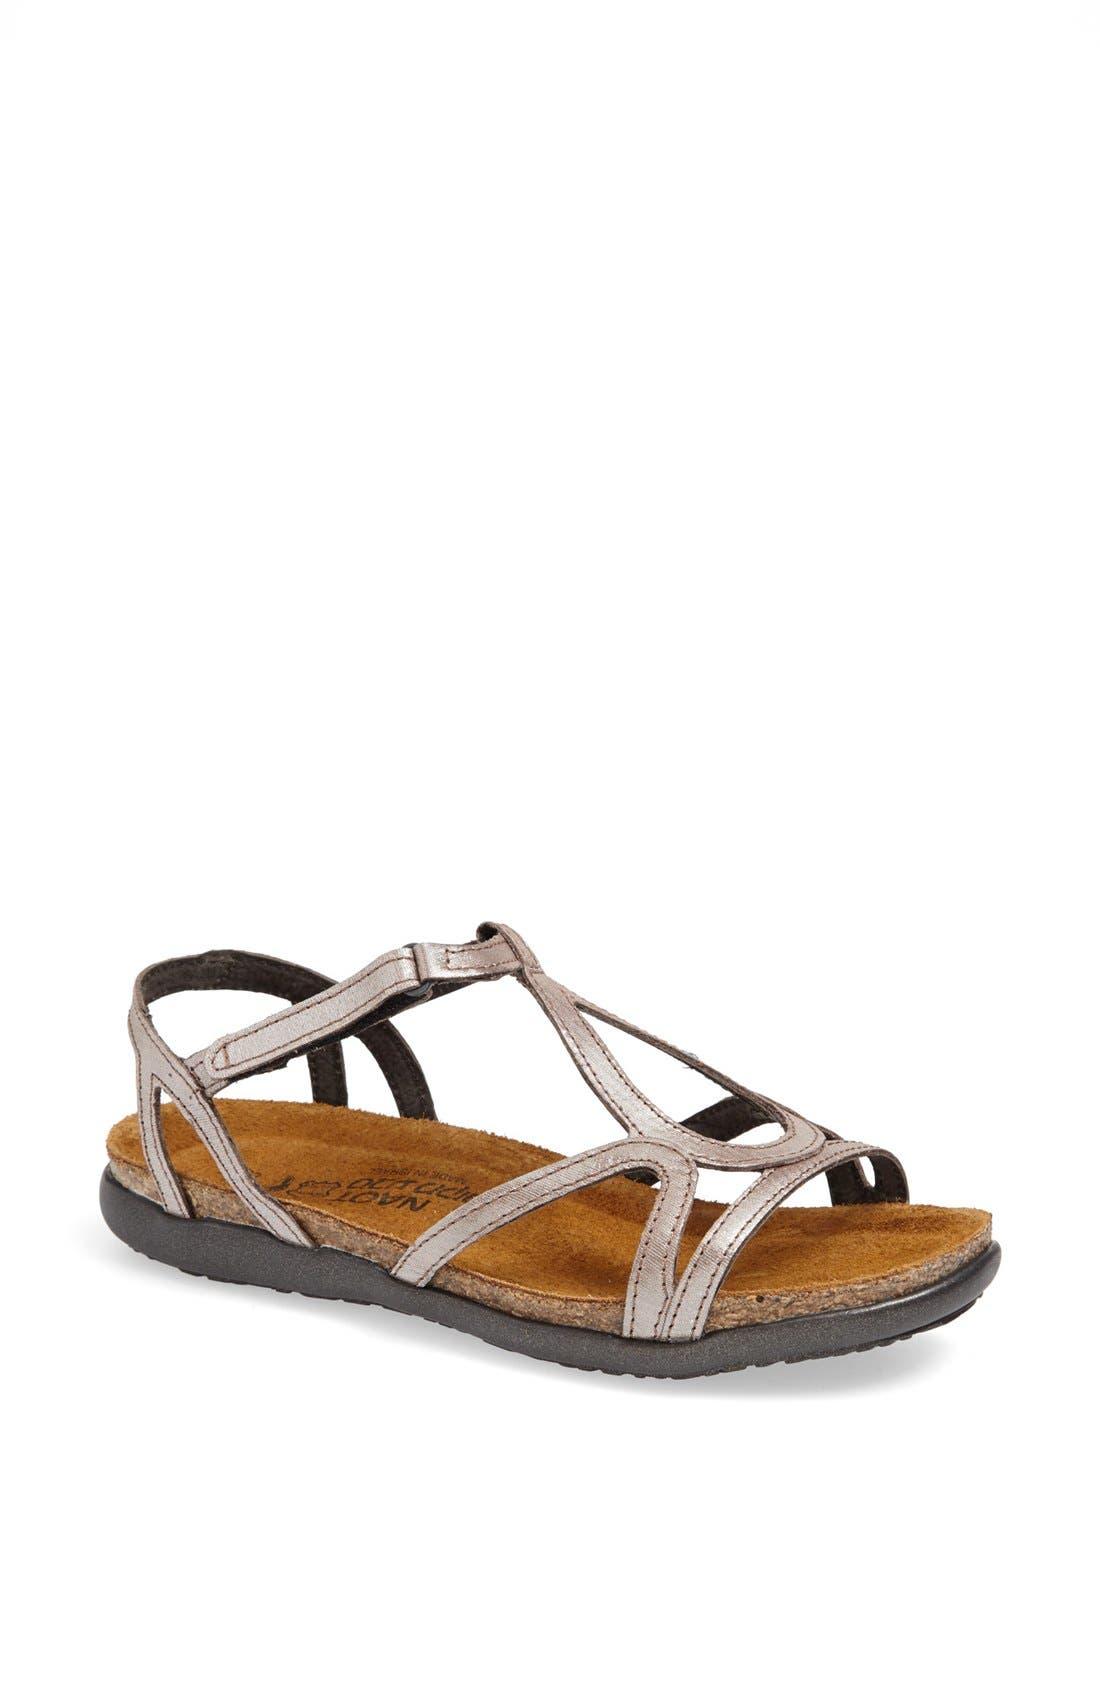 'Dorith' Sandal,                             Main thumbnail 1, color,                             Silver Threads Leather